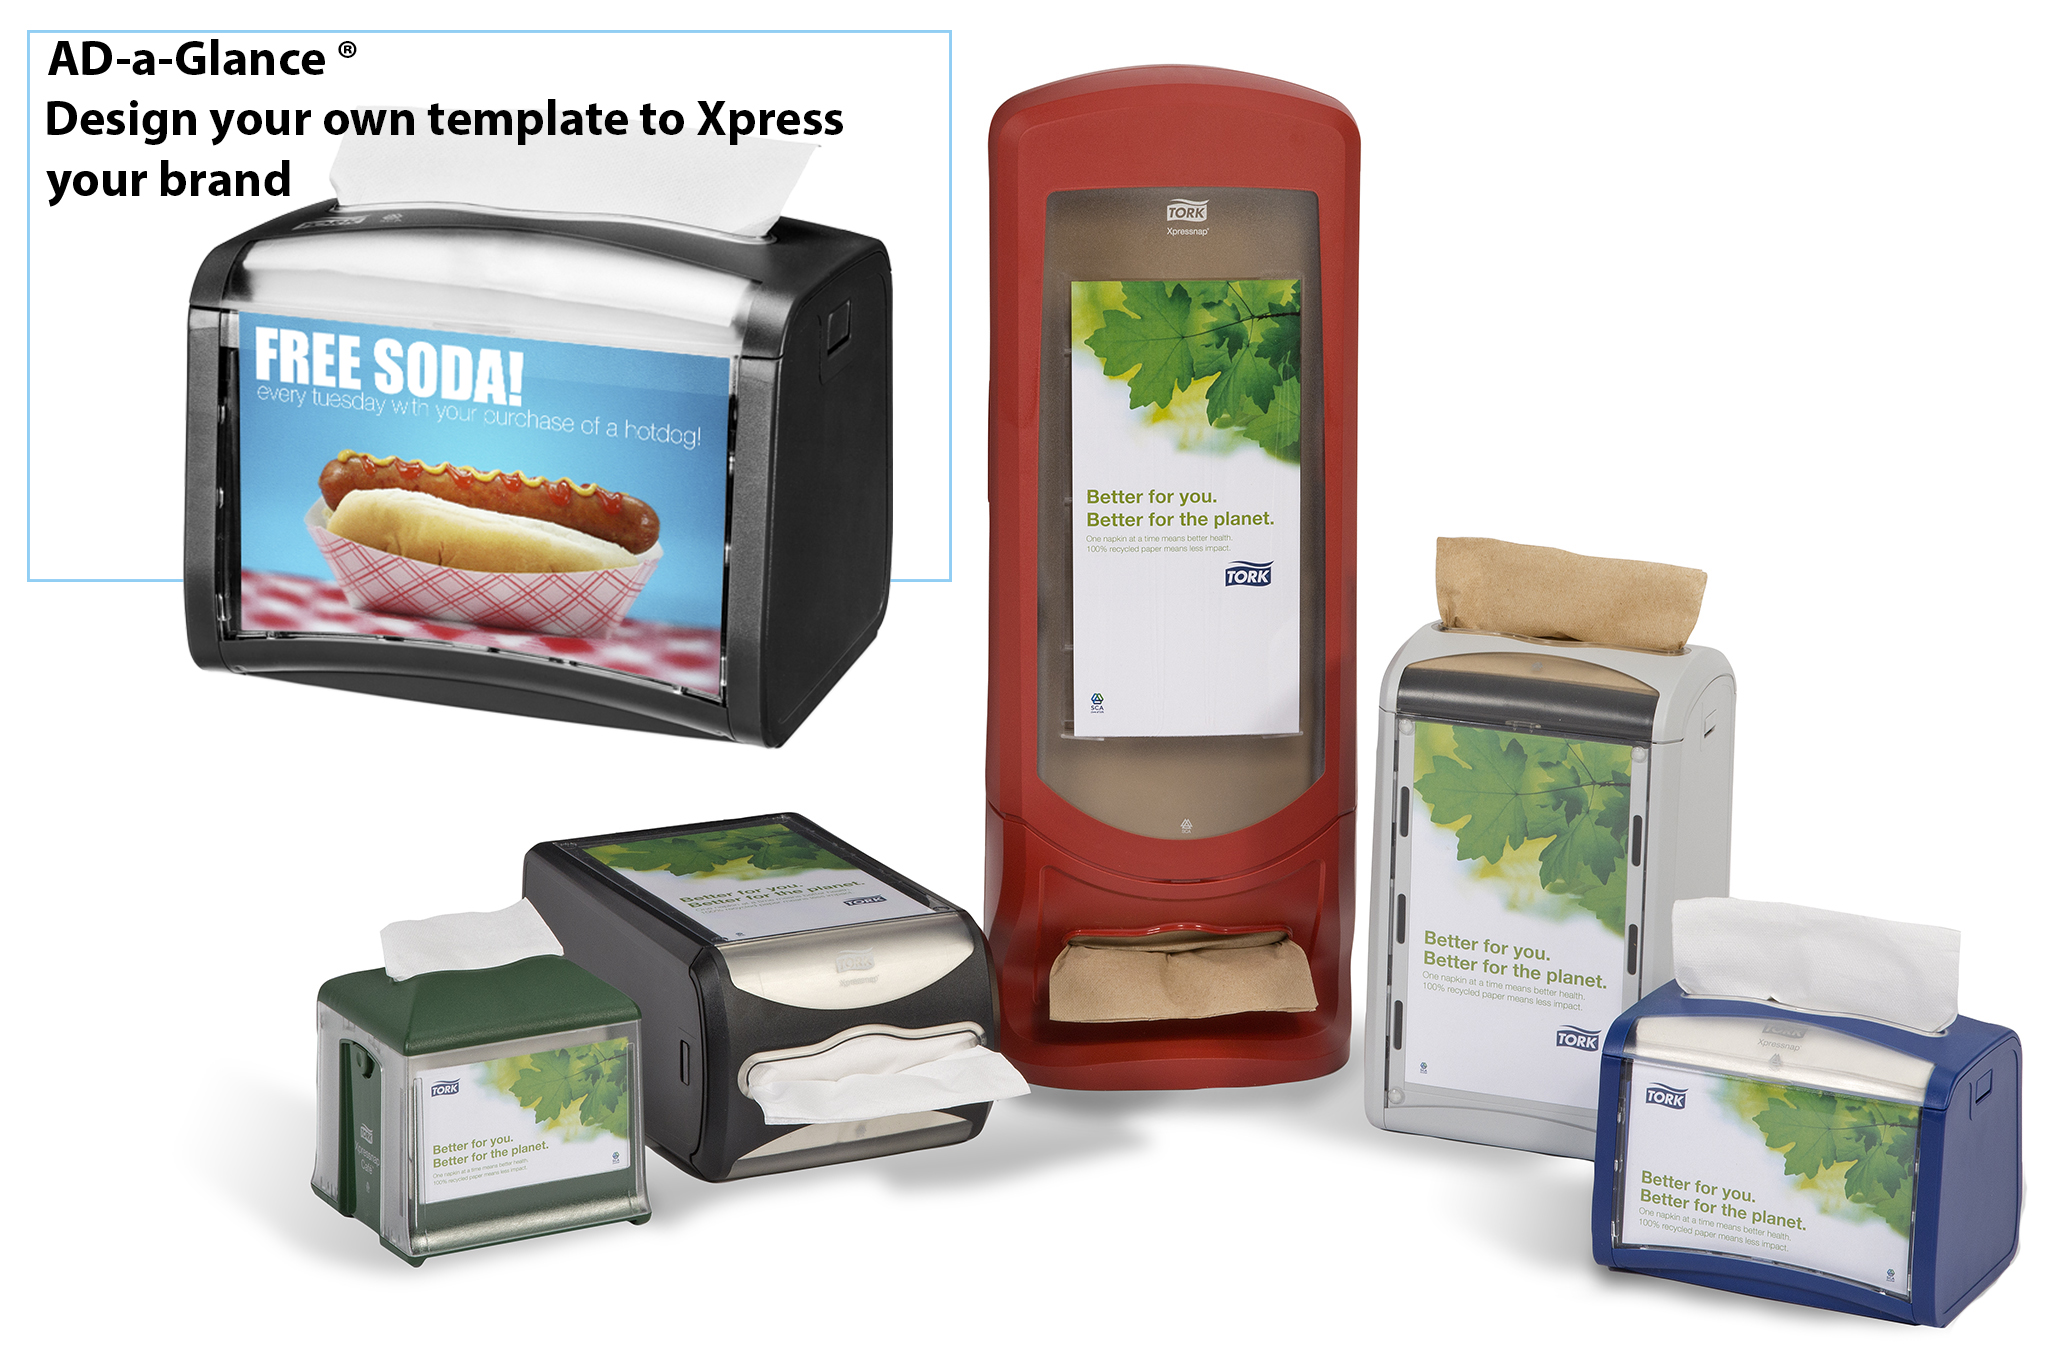 HDi Xpressnap napkin Dispensers